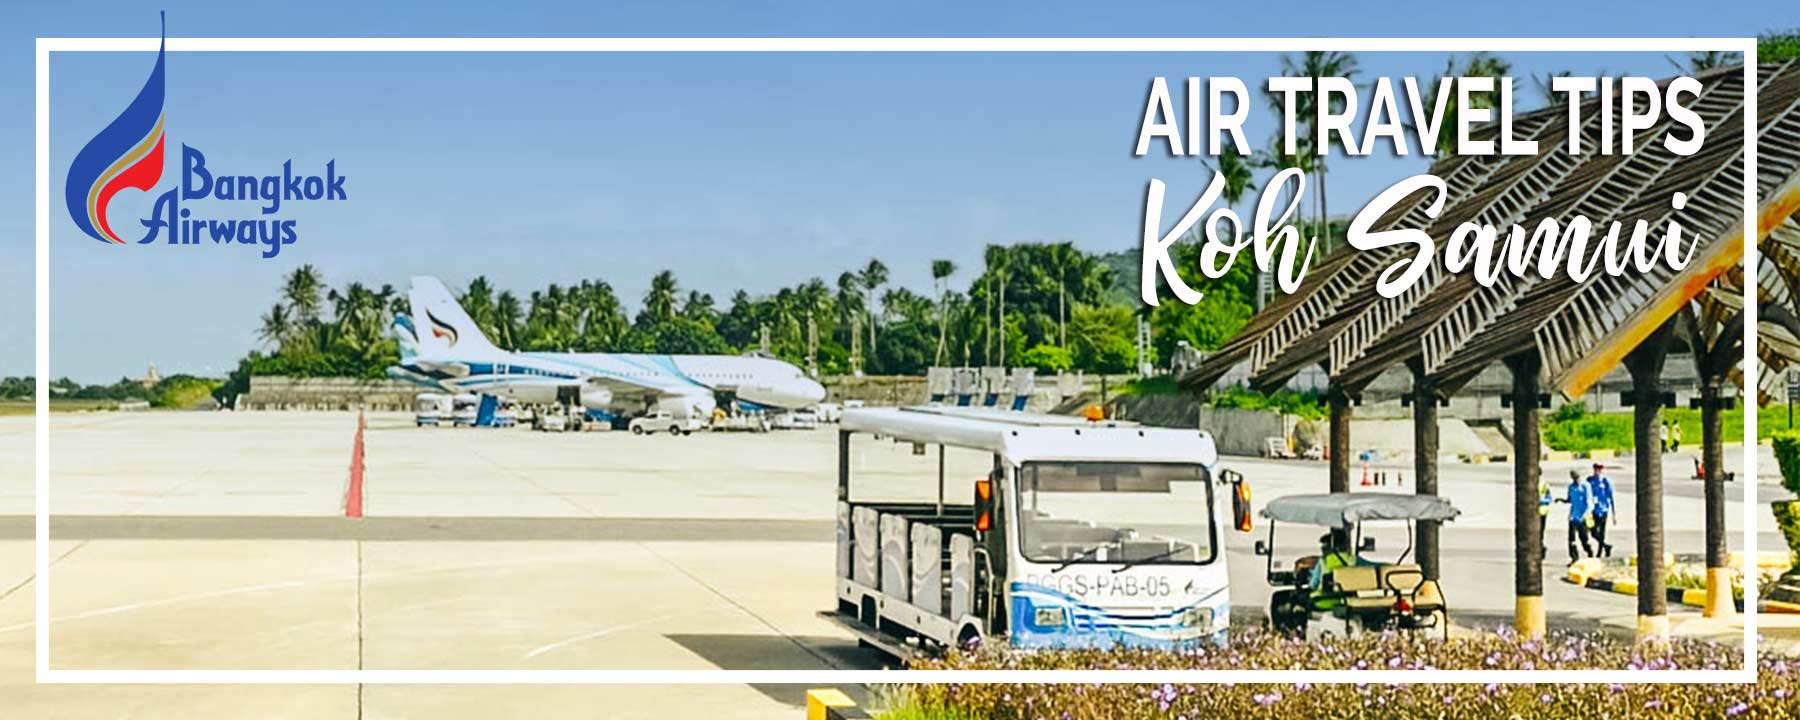 Bangkok Airways to Koh Samui | Best Airline to Travel from Kuala Lumpur